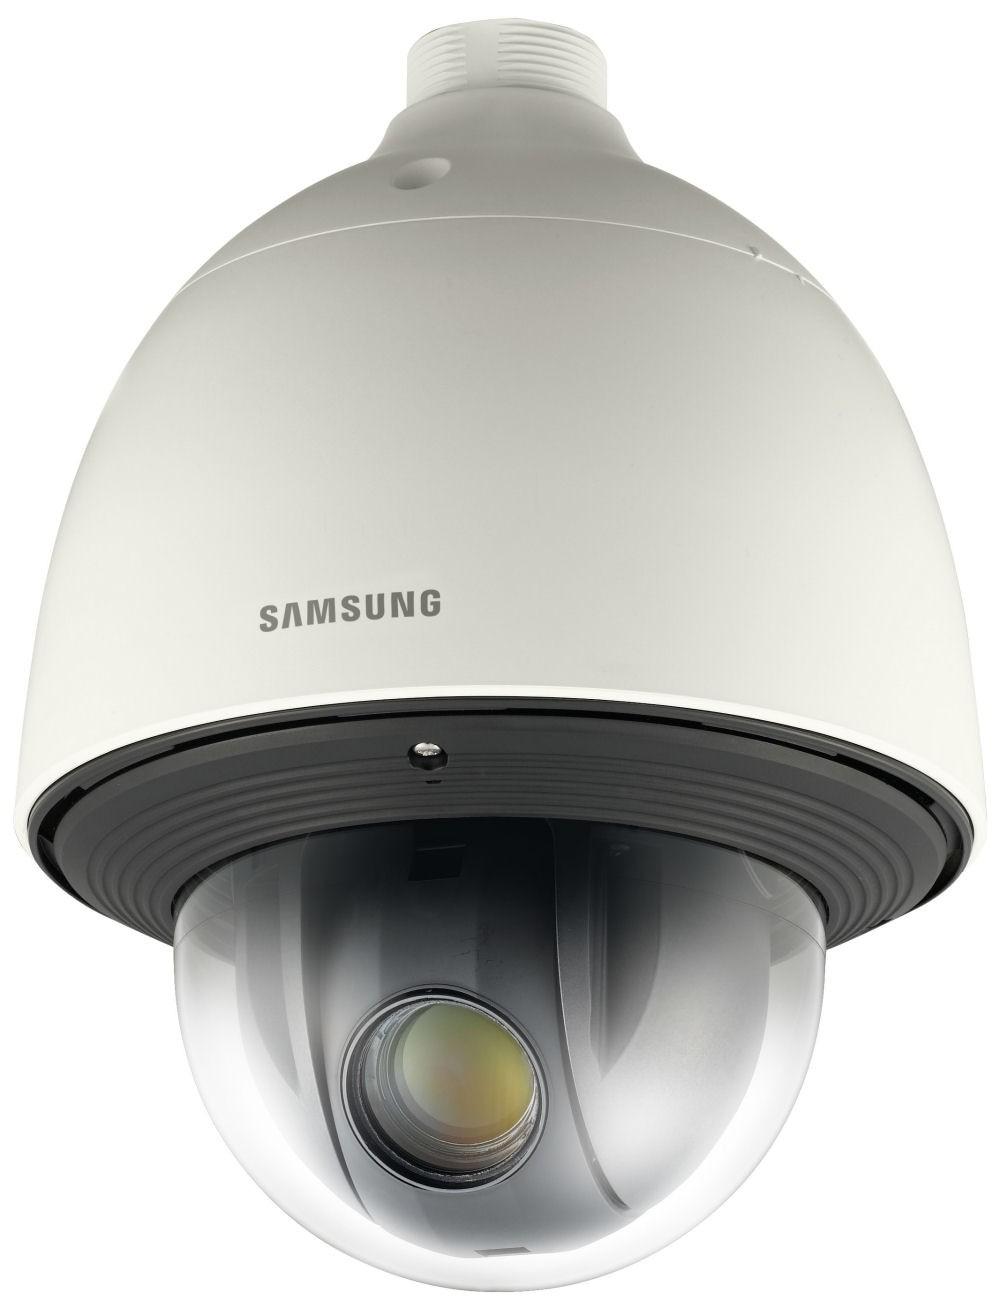 Samsung SCP2371H 37x High Resolution PTZ Dome Camera